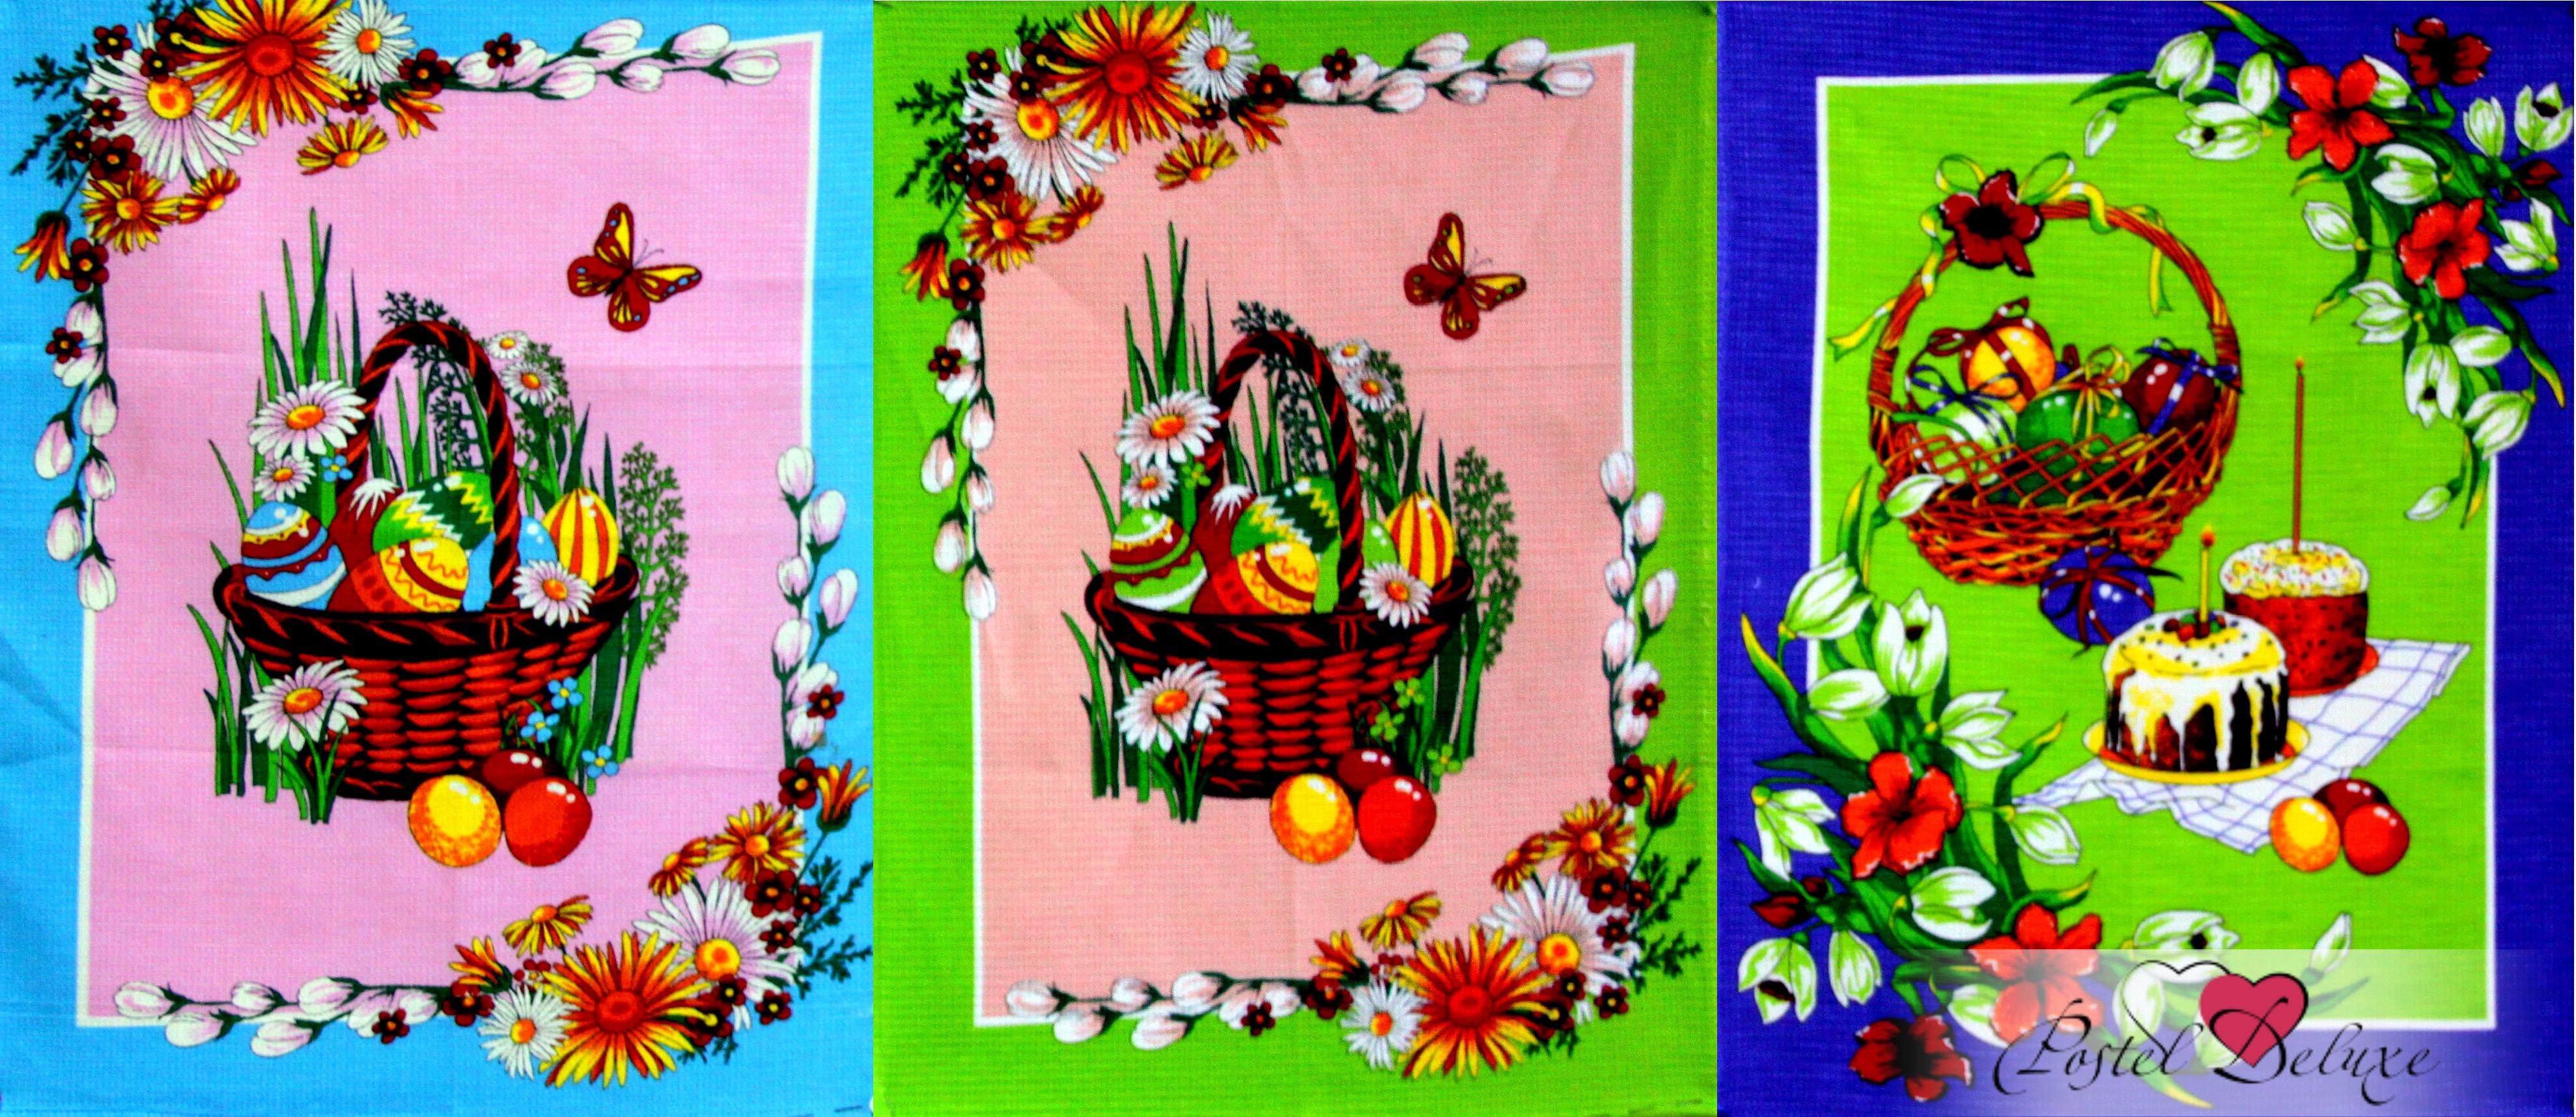 {} Elegante Кухонное полотенце Пасха (45х60 см - 3 шт) полотенца jollein муслиновое полотенце пончо 45х60 см